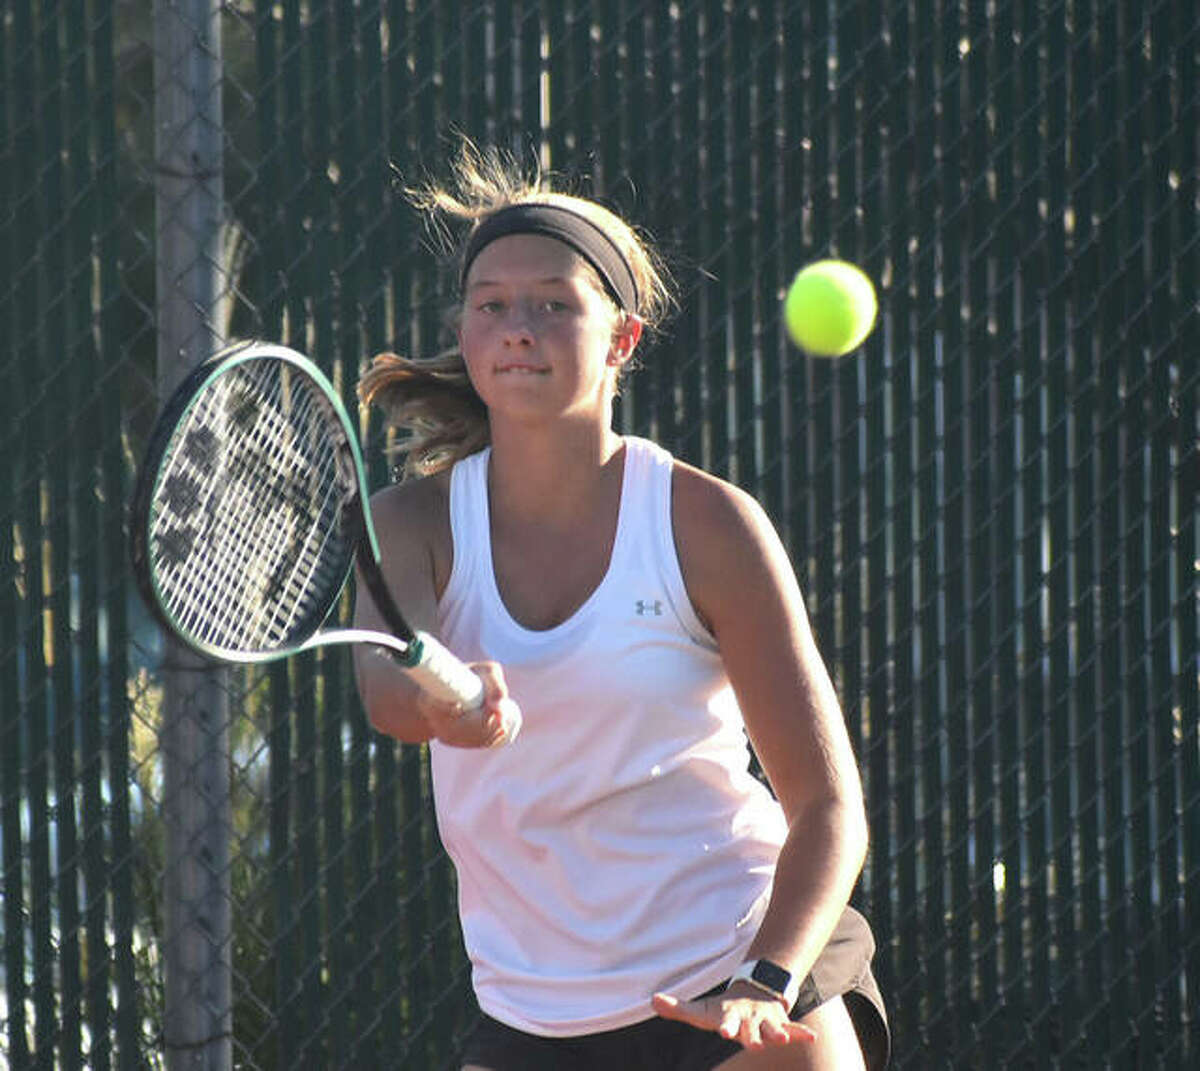 Edwardsville's Zoe Byron hits a return shot during her No. 3 singles match against Belleville East on Thursday inside the EHS Tennis Center.